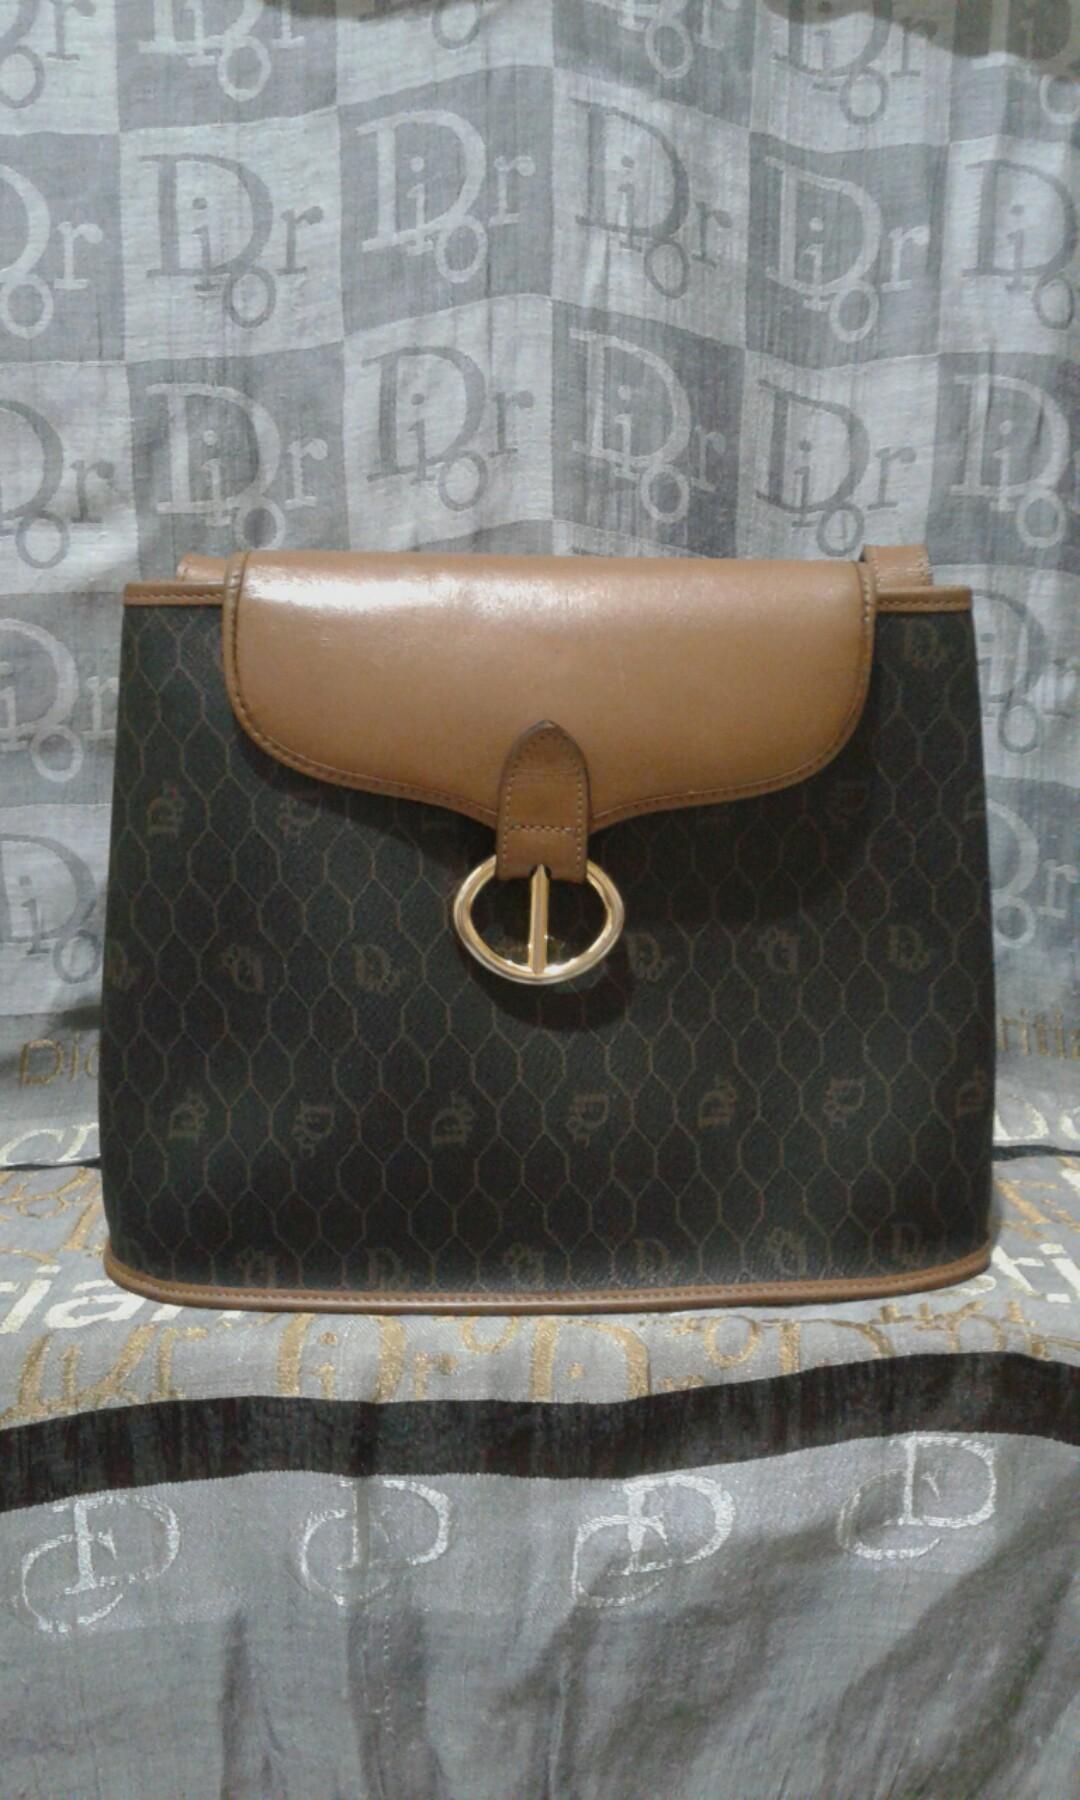 fa943325dc73 SALE!!! Christian Dior slingbag